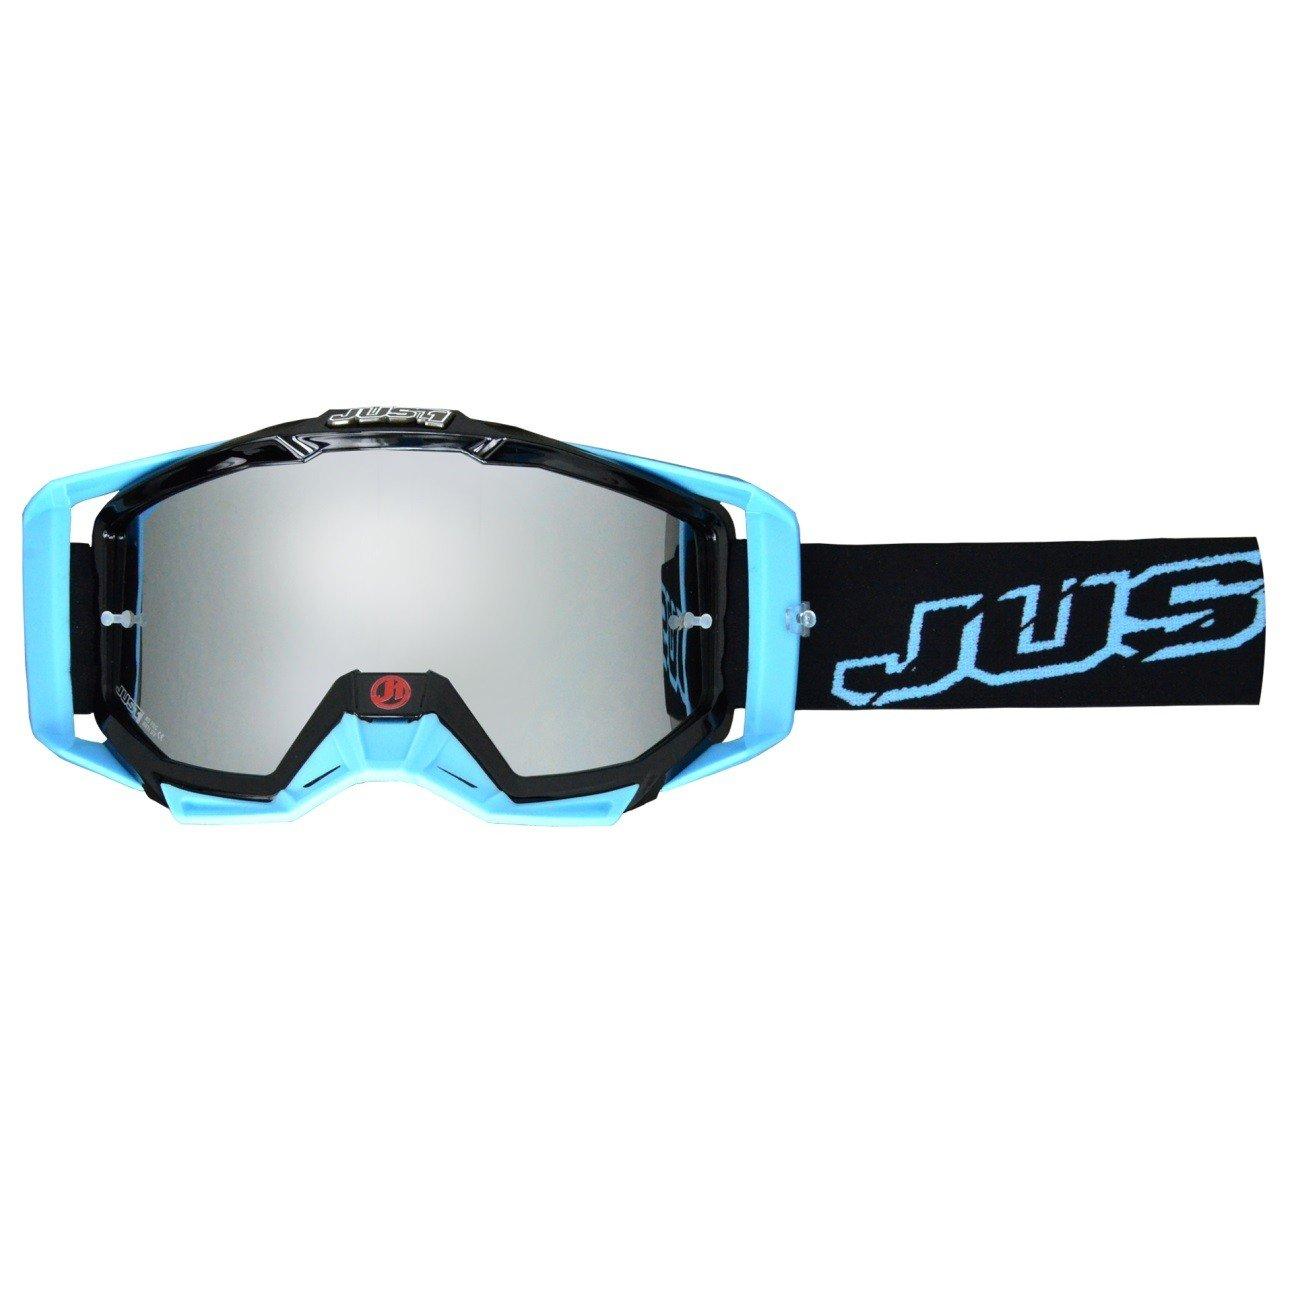 JUST1 Iris Neon Black/Blue